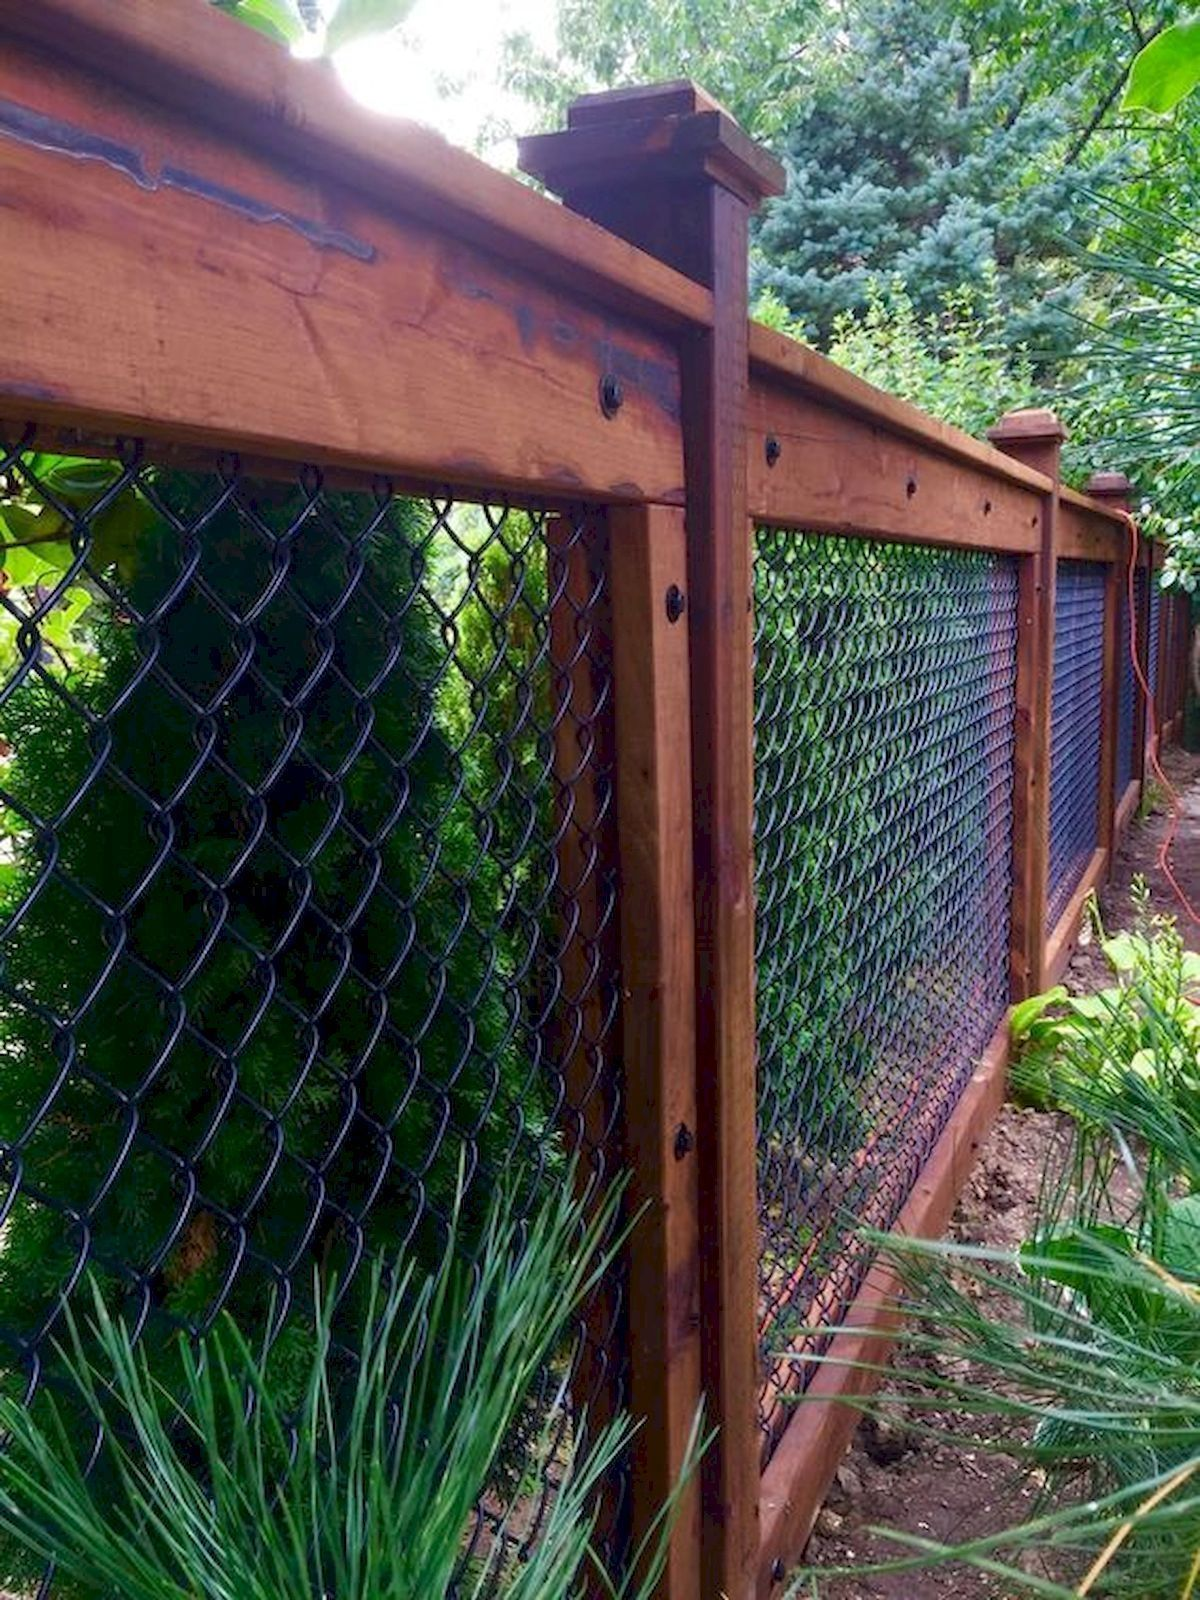 30+ #Classy #Backyard #Garden #Ideas #With #Fence #Design - 30+ Classy Backyard Garden Ideas With Fence Design